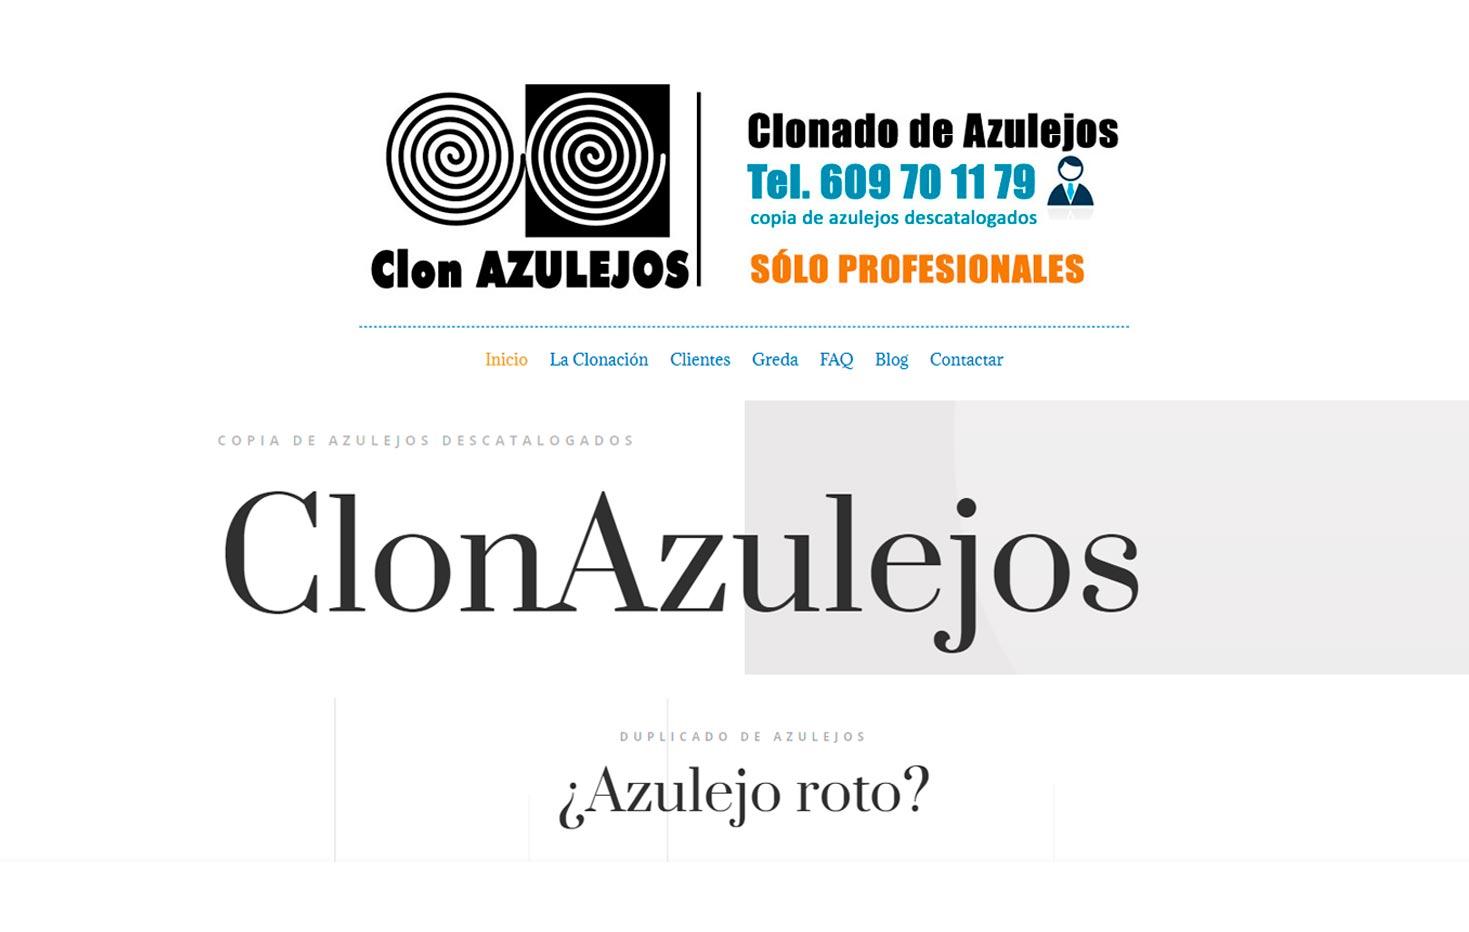 Clon Azulejos